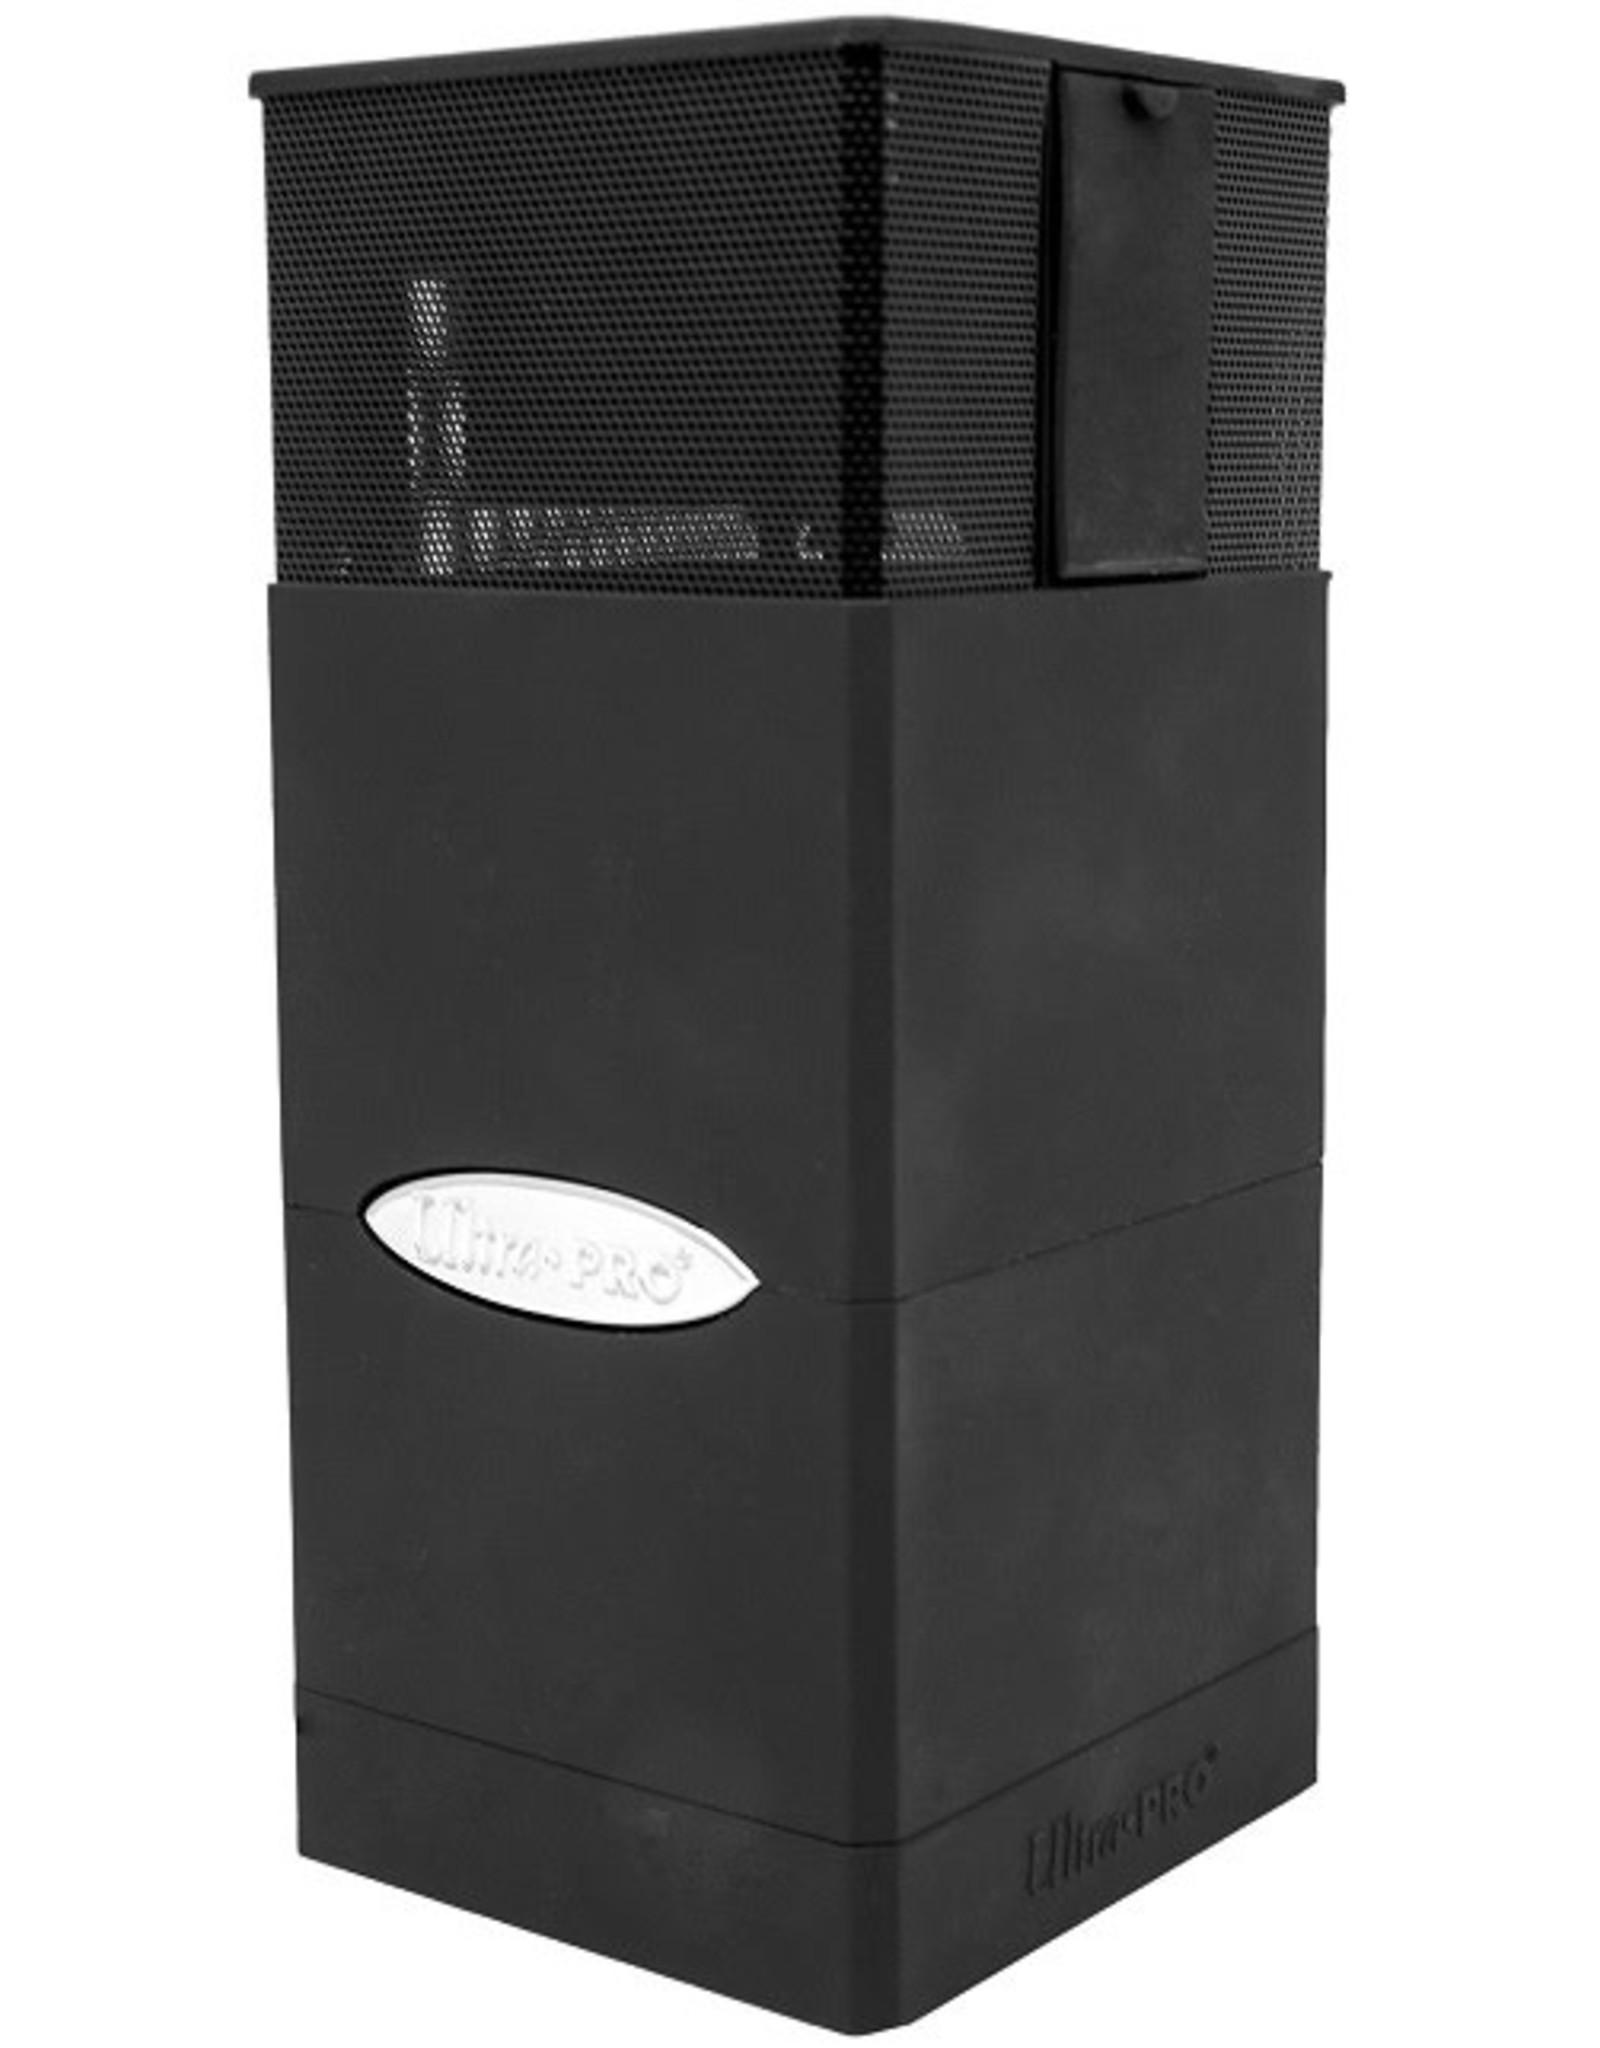 Ultra Pro UP Satin Tower Boombox